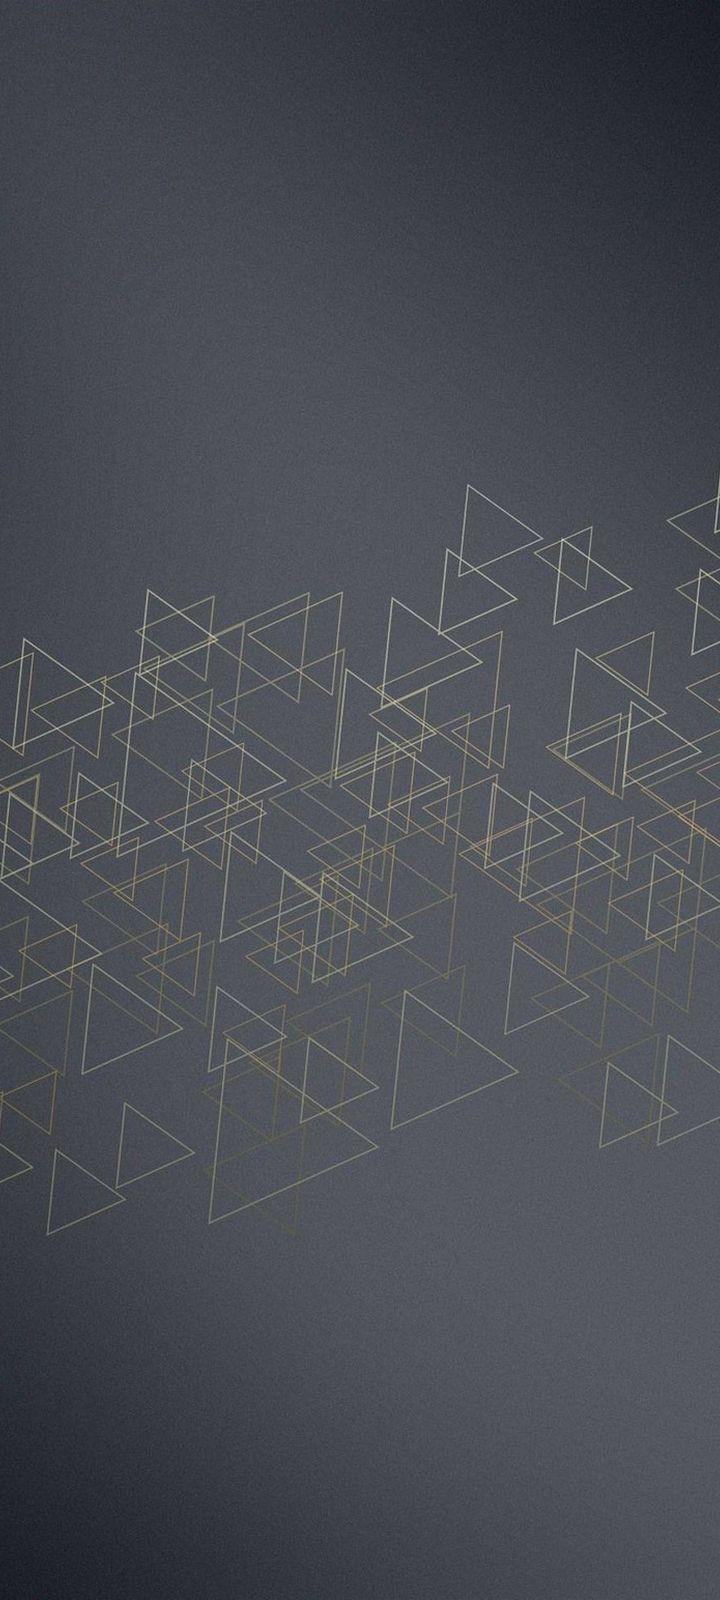 Triangles Icon Texture Wallpaper 720x1600